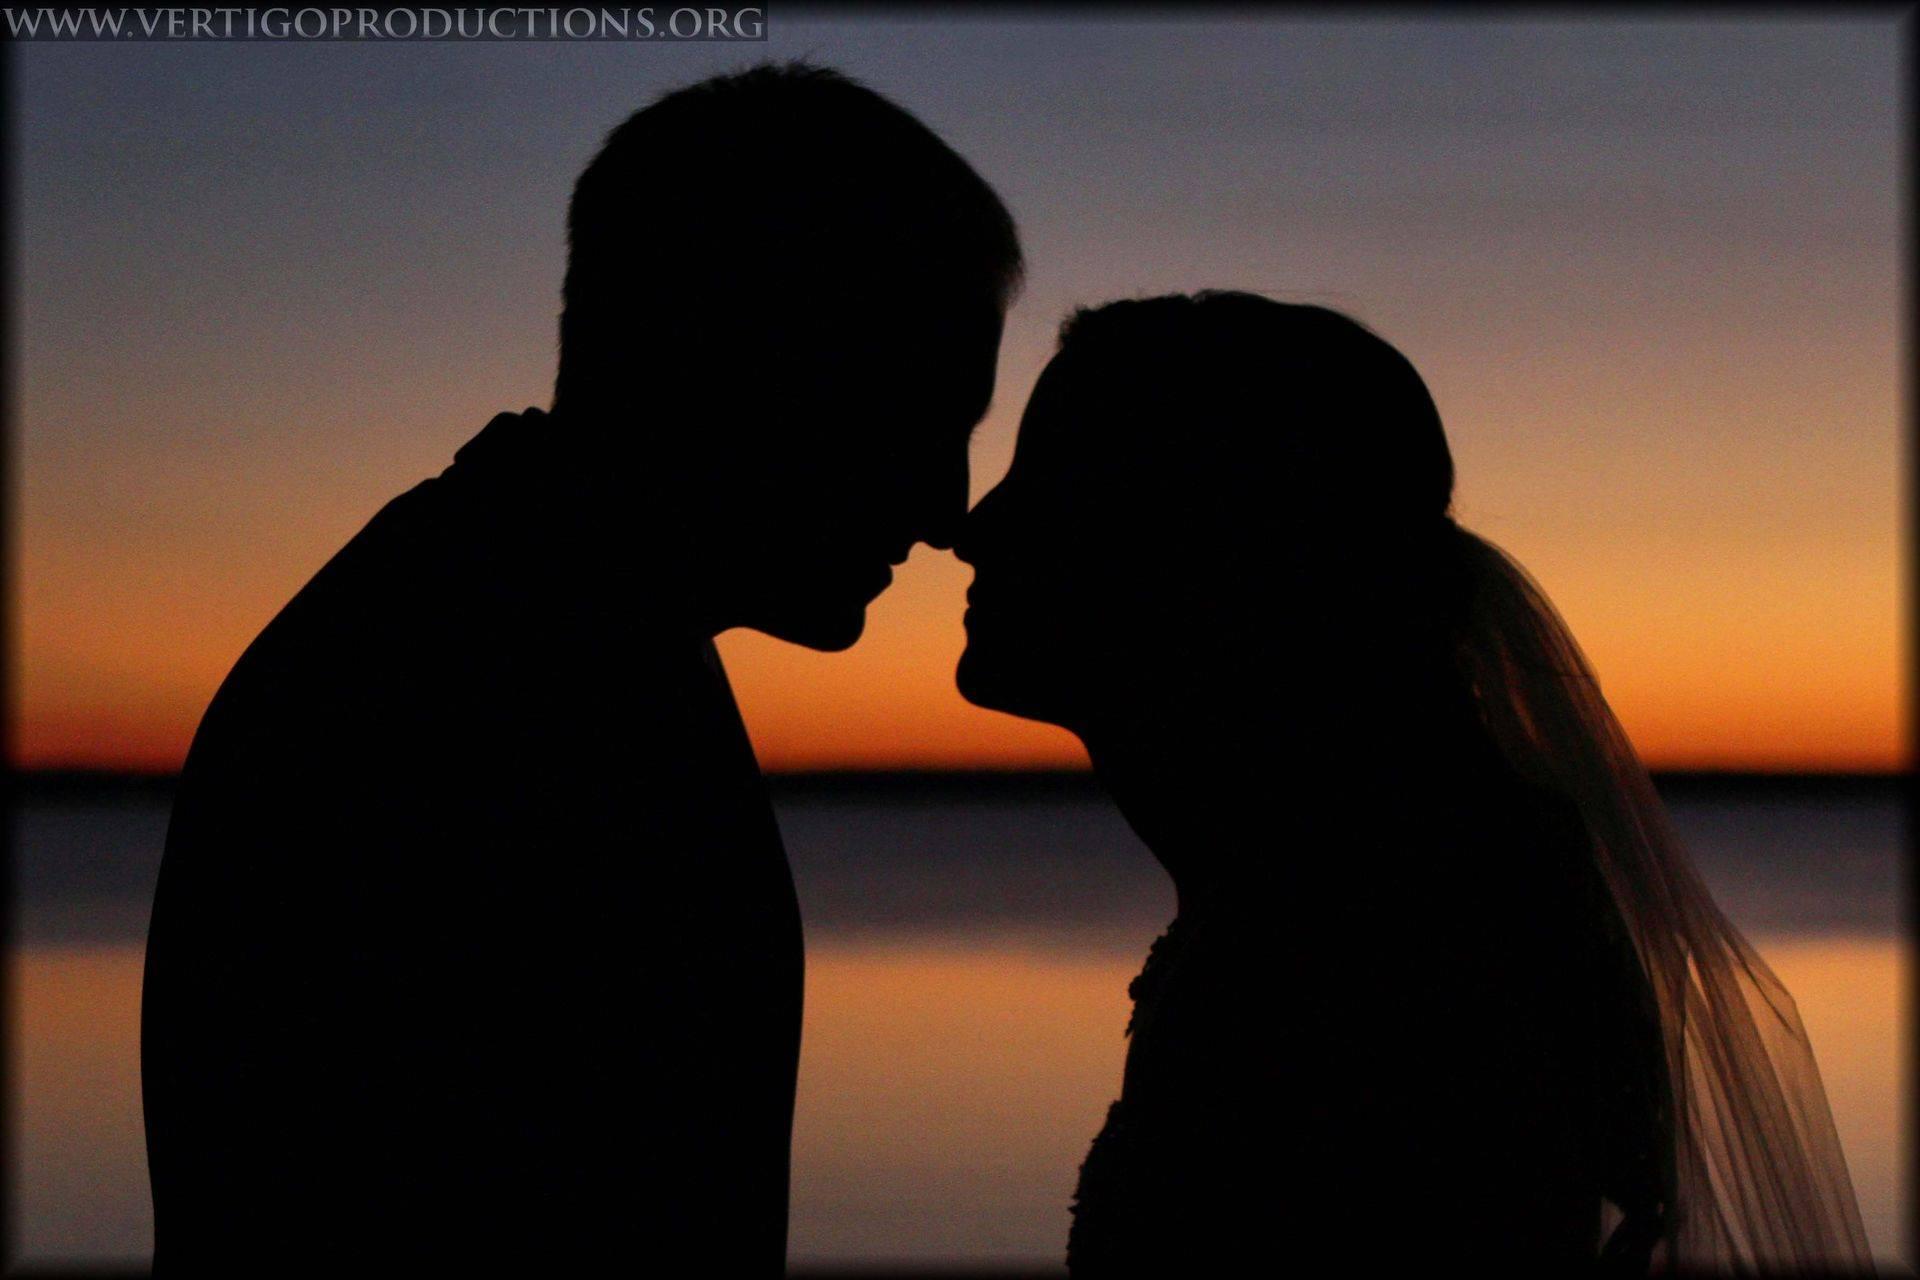 kingston wedding photographer, kingston yacht club, vertigo productions photography